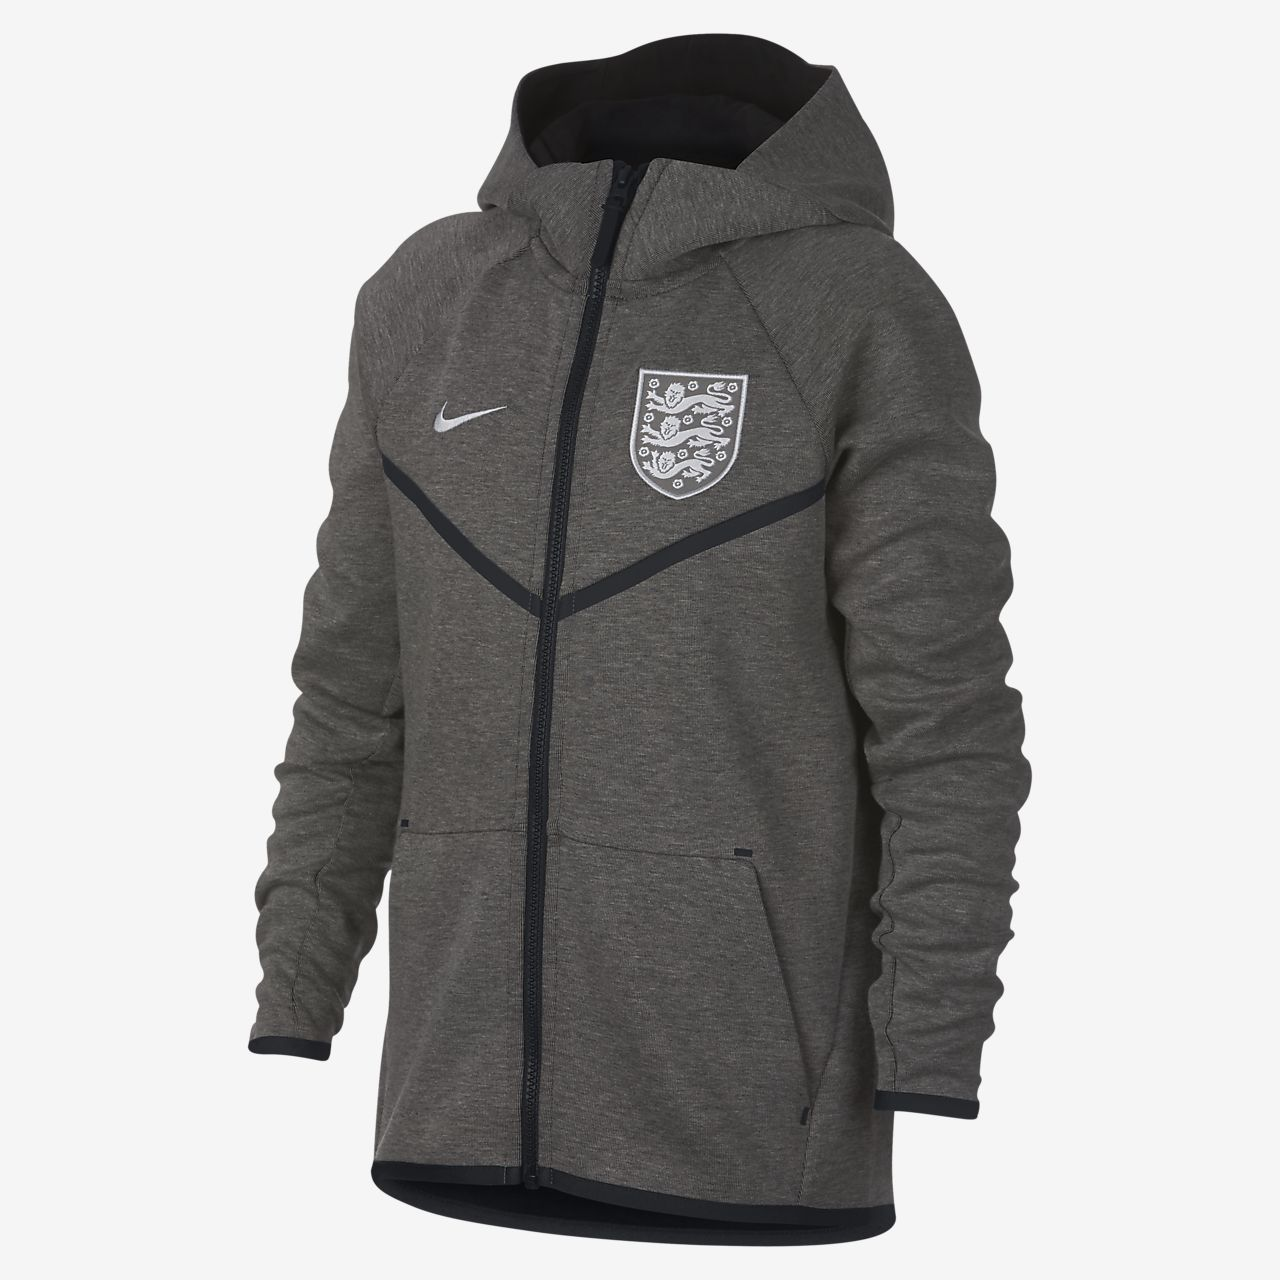 Nike jacka ungdom